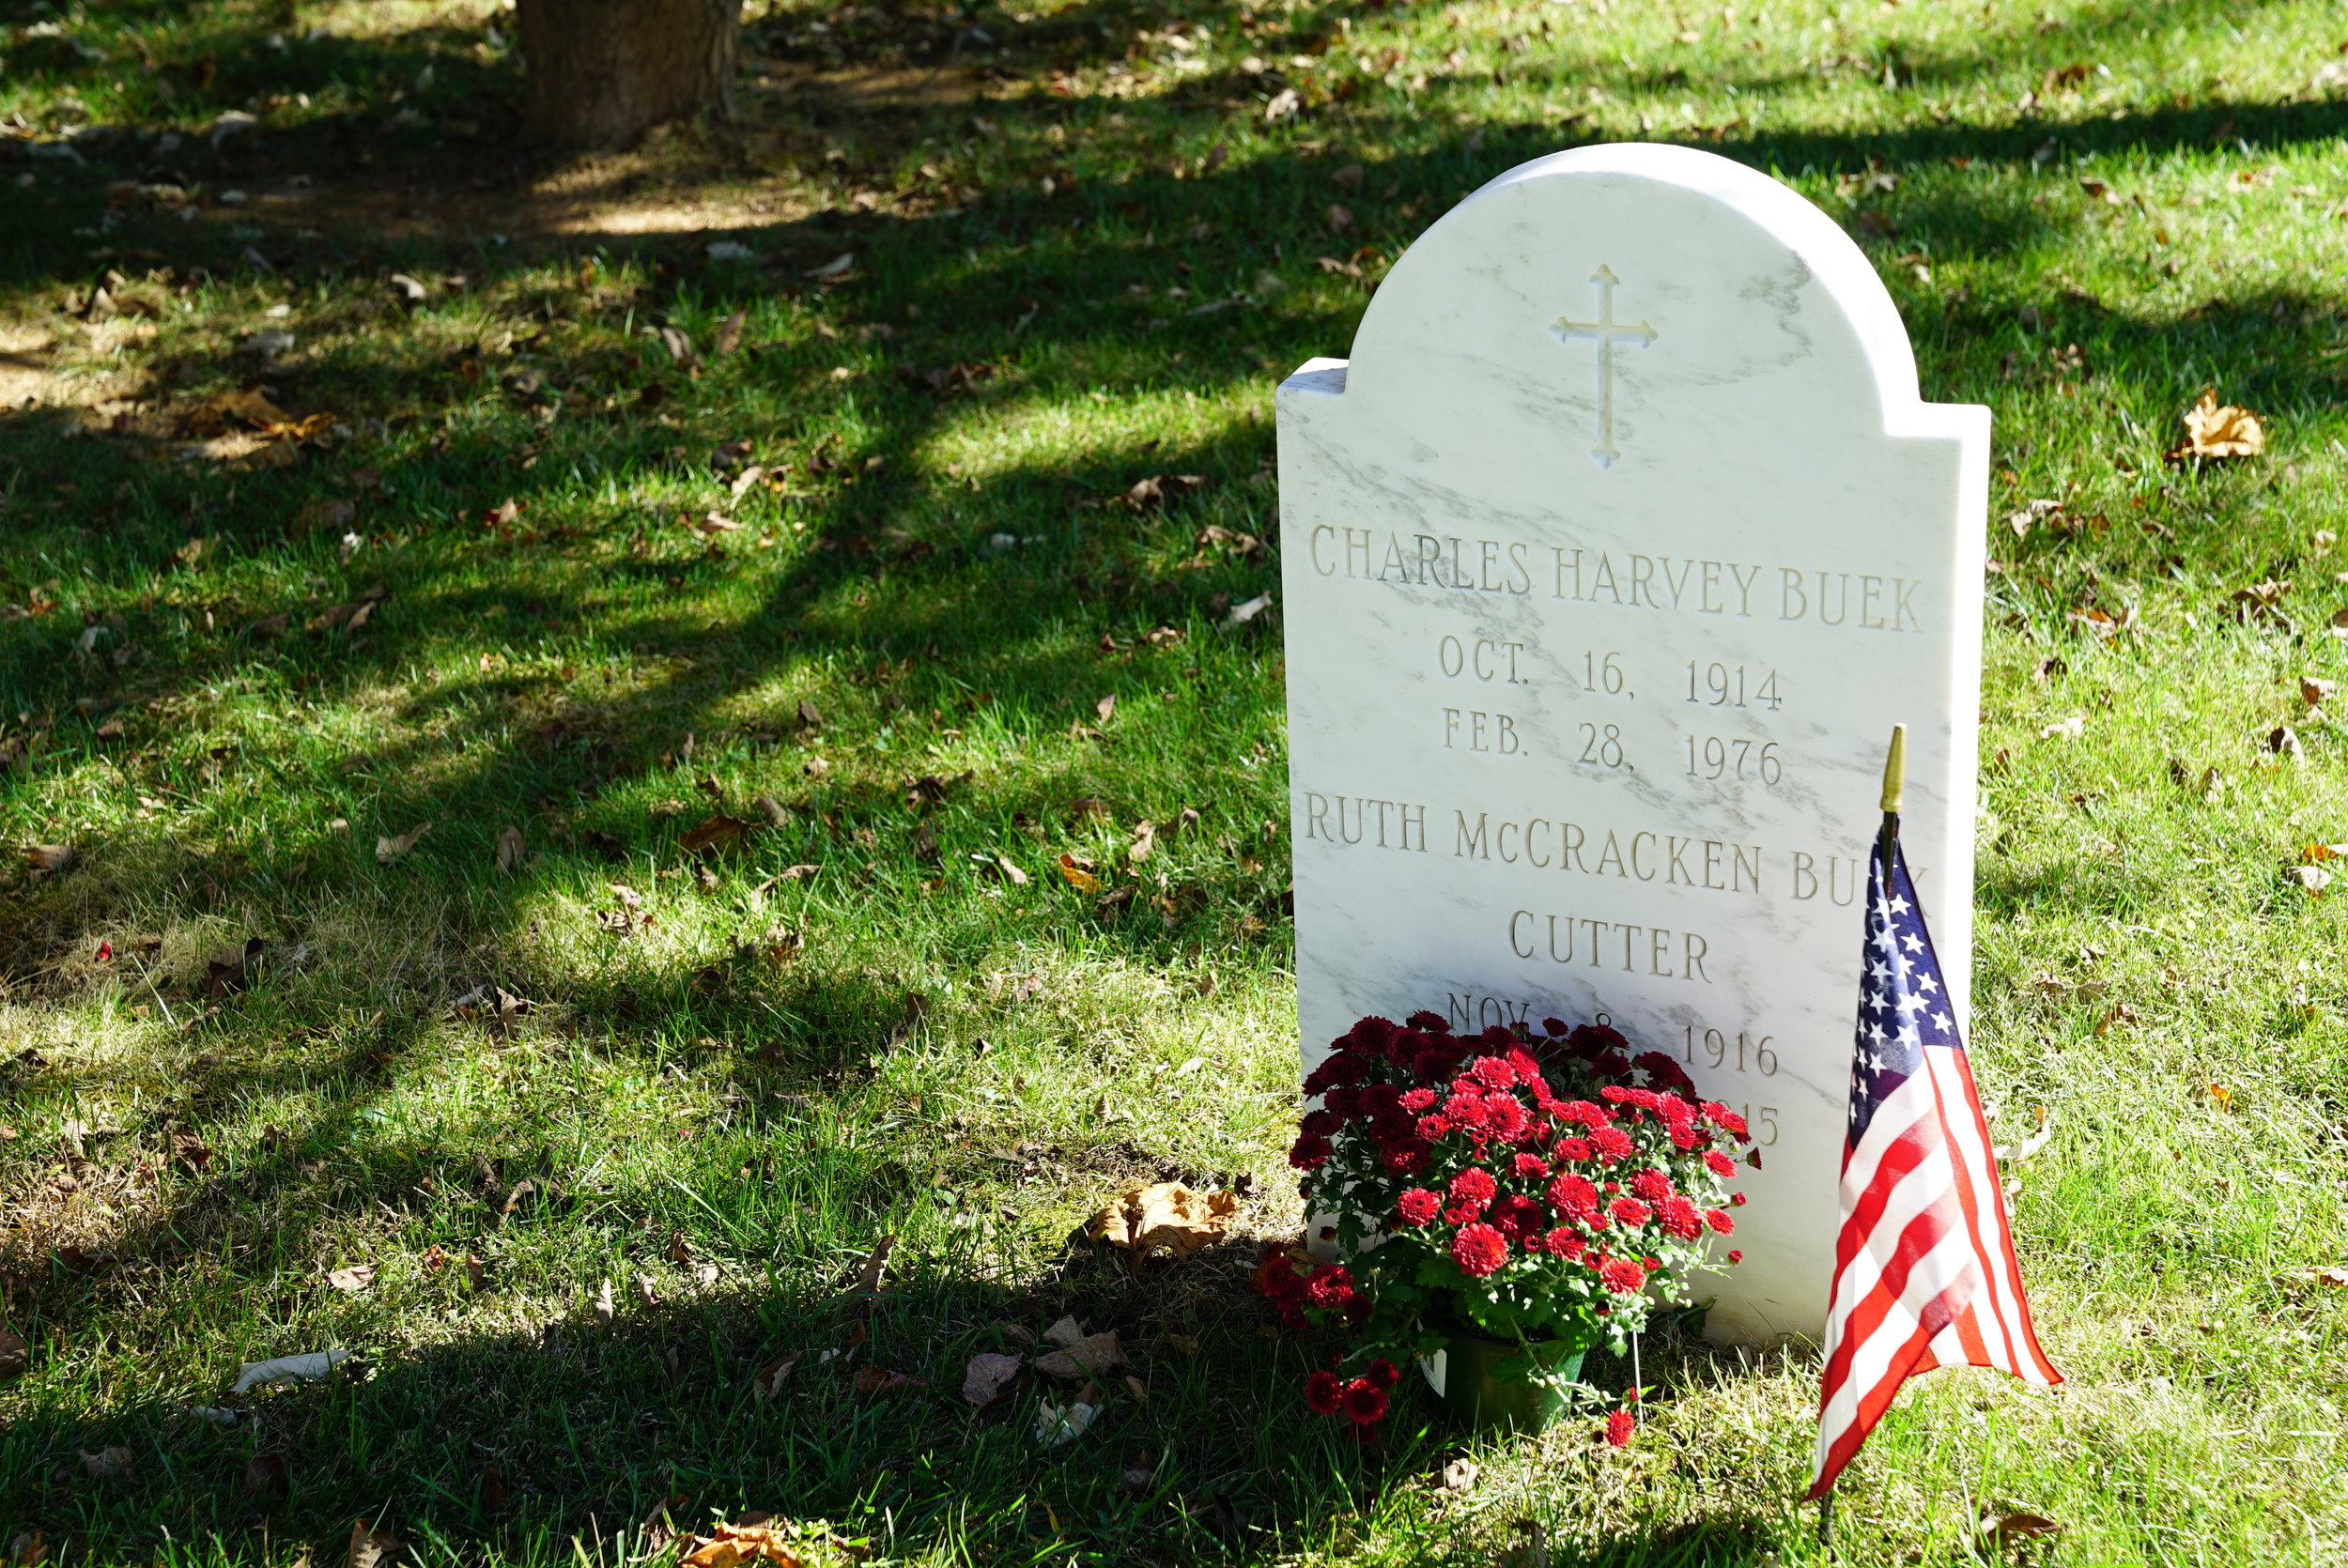 Gravestone at St. Christopher's Church Cemetery. Gladwyne, Pennsylvania.